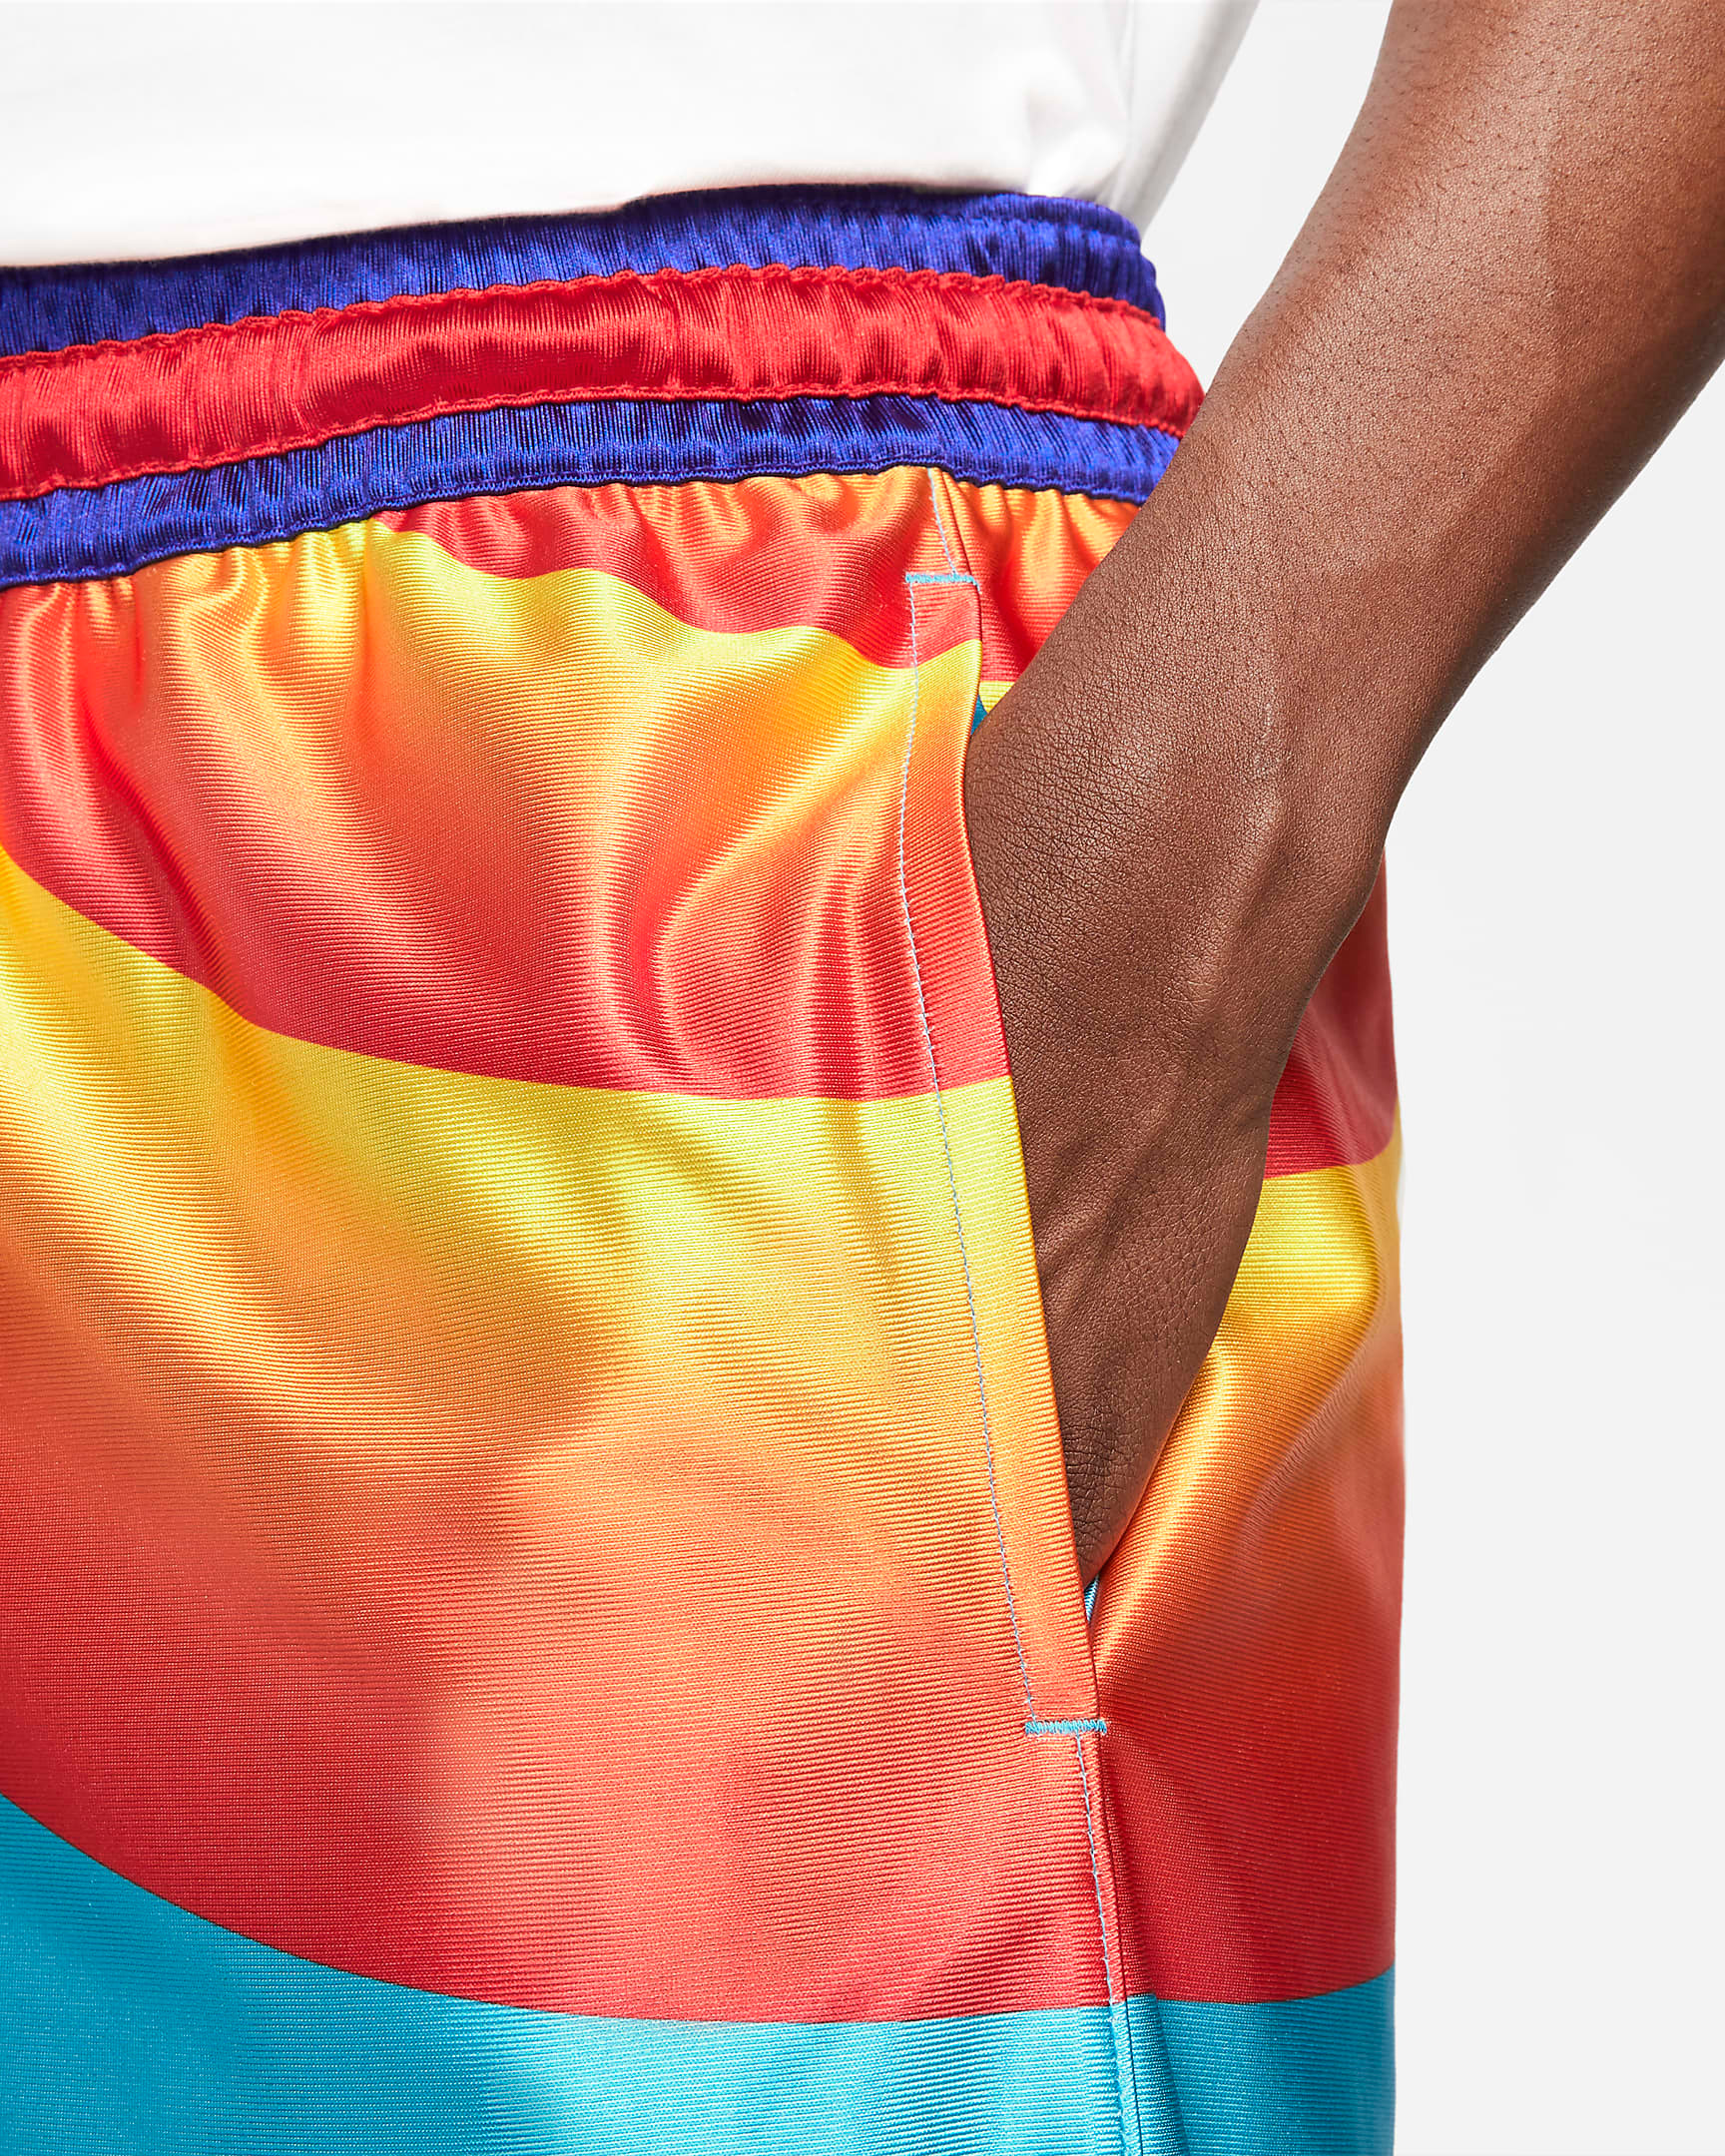 nike-lebron-space-jam-a-new-legacy-tune-squad-shorts-4